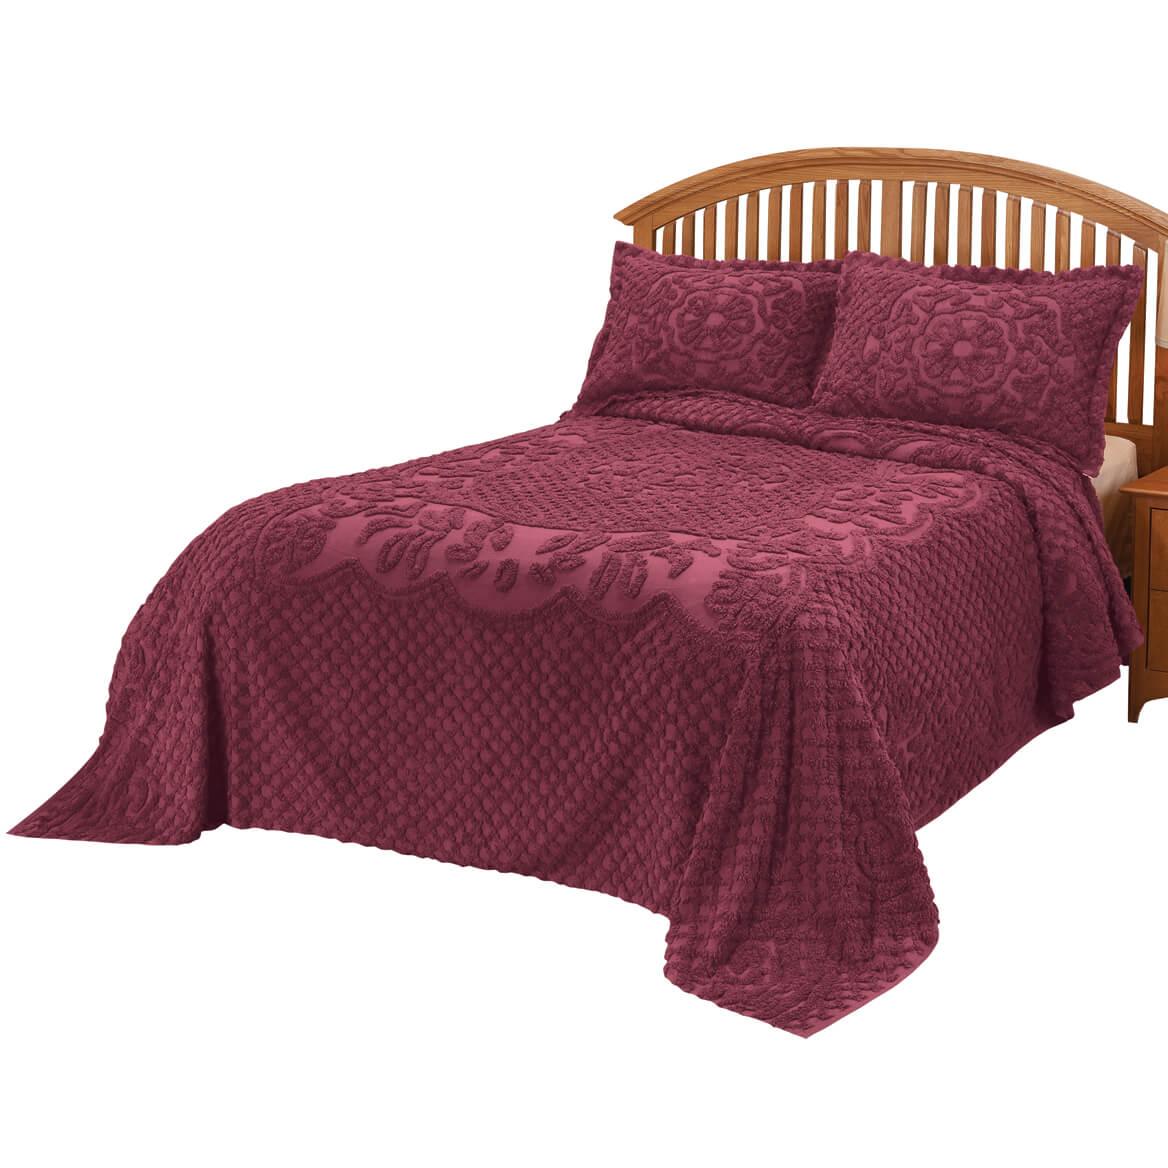 The Martha Chenille Bedspread by OakRidge™-345120